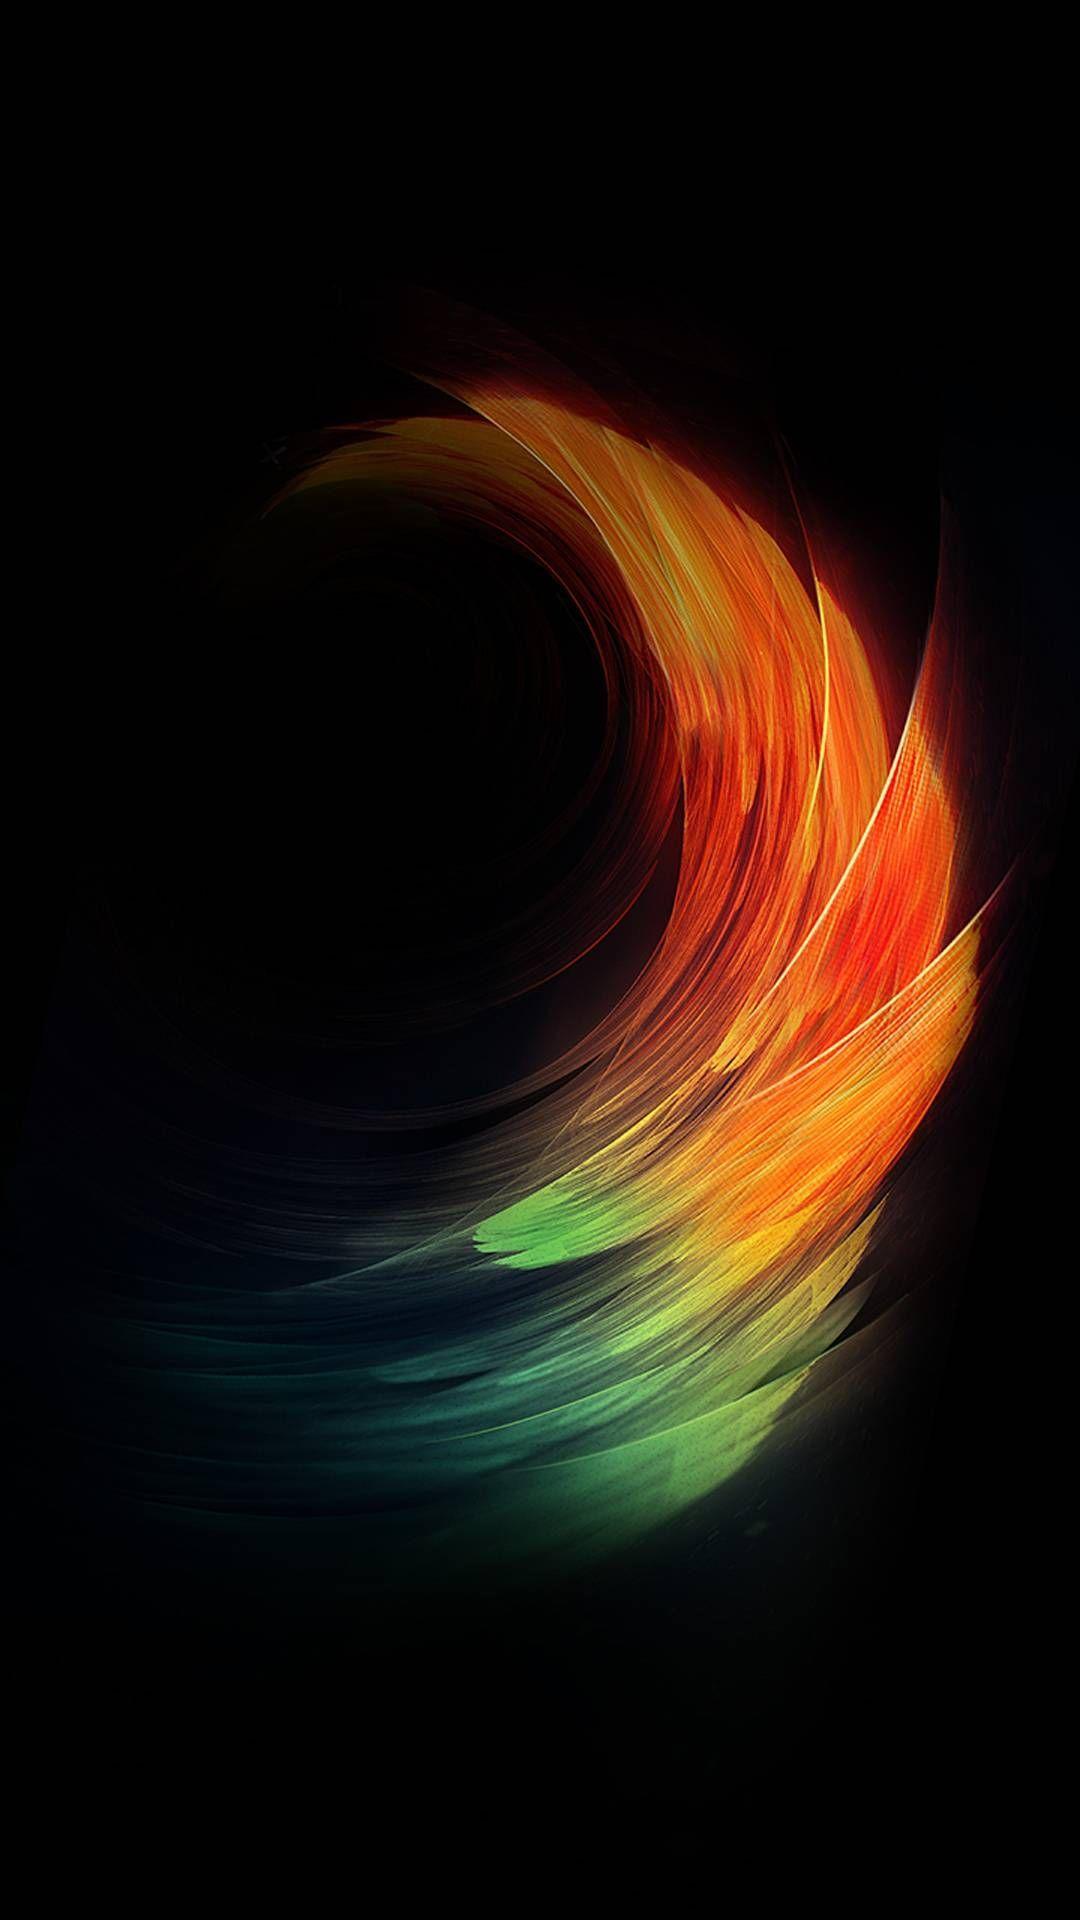 amoled abstract dark, iPhone Wallpaper Iphone wallpaper